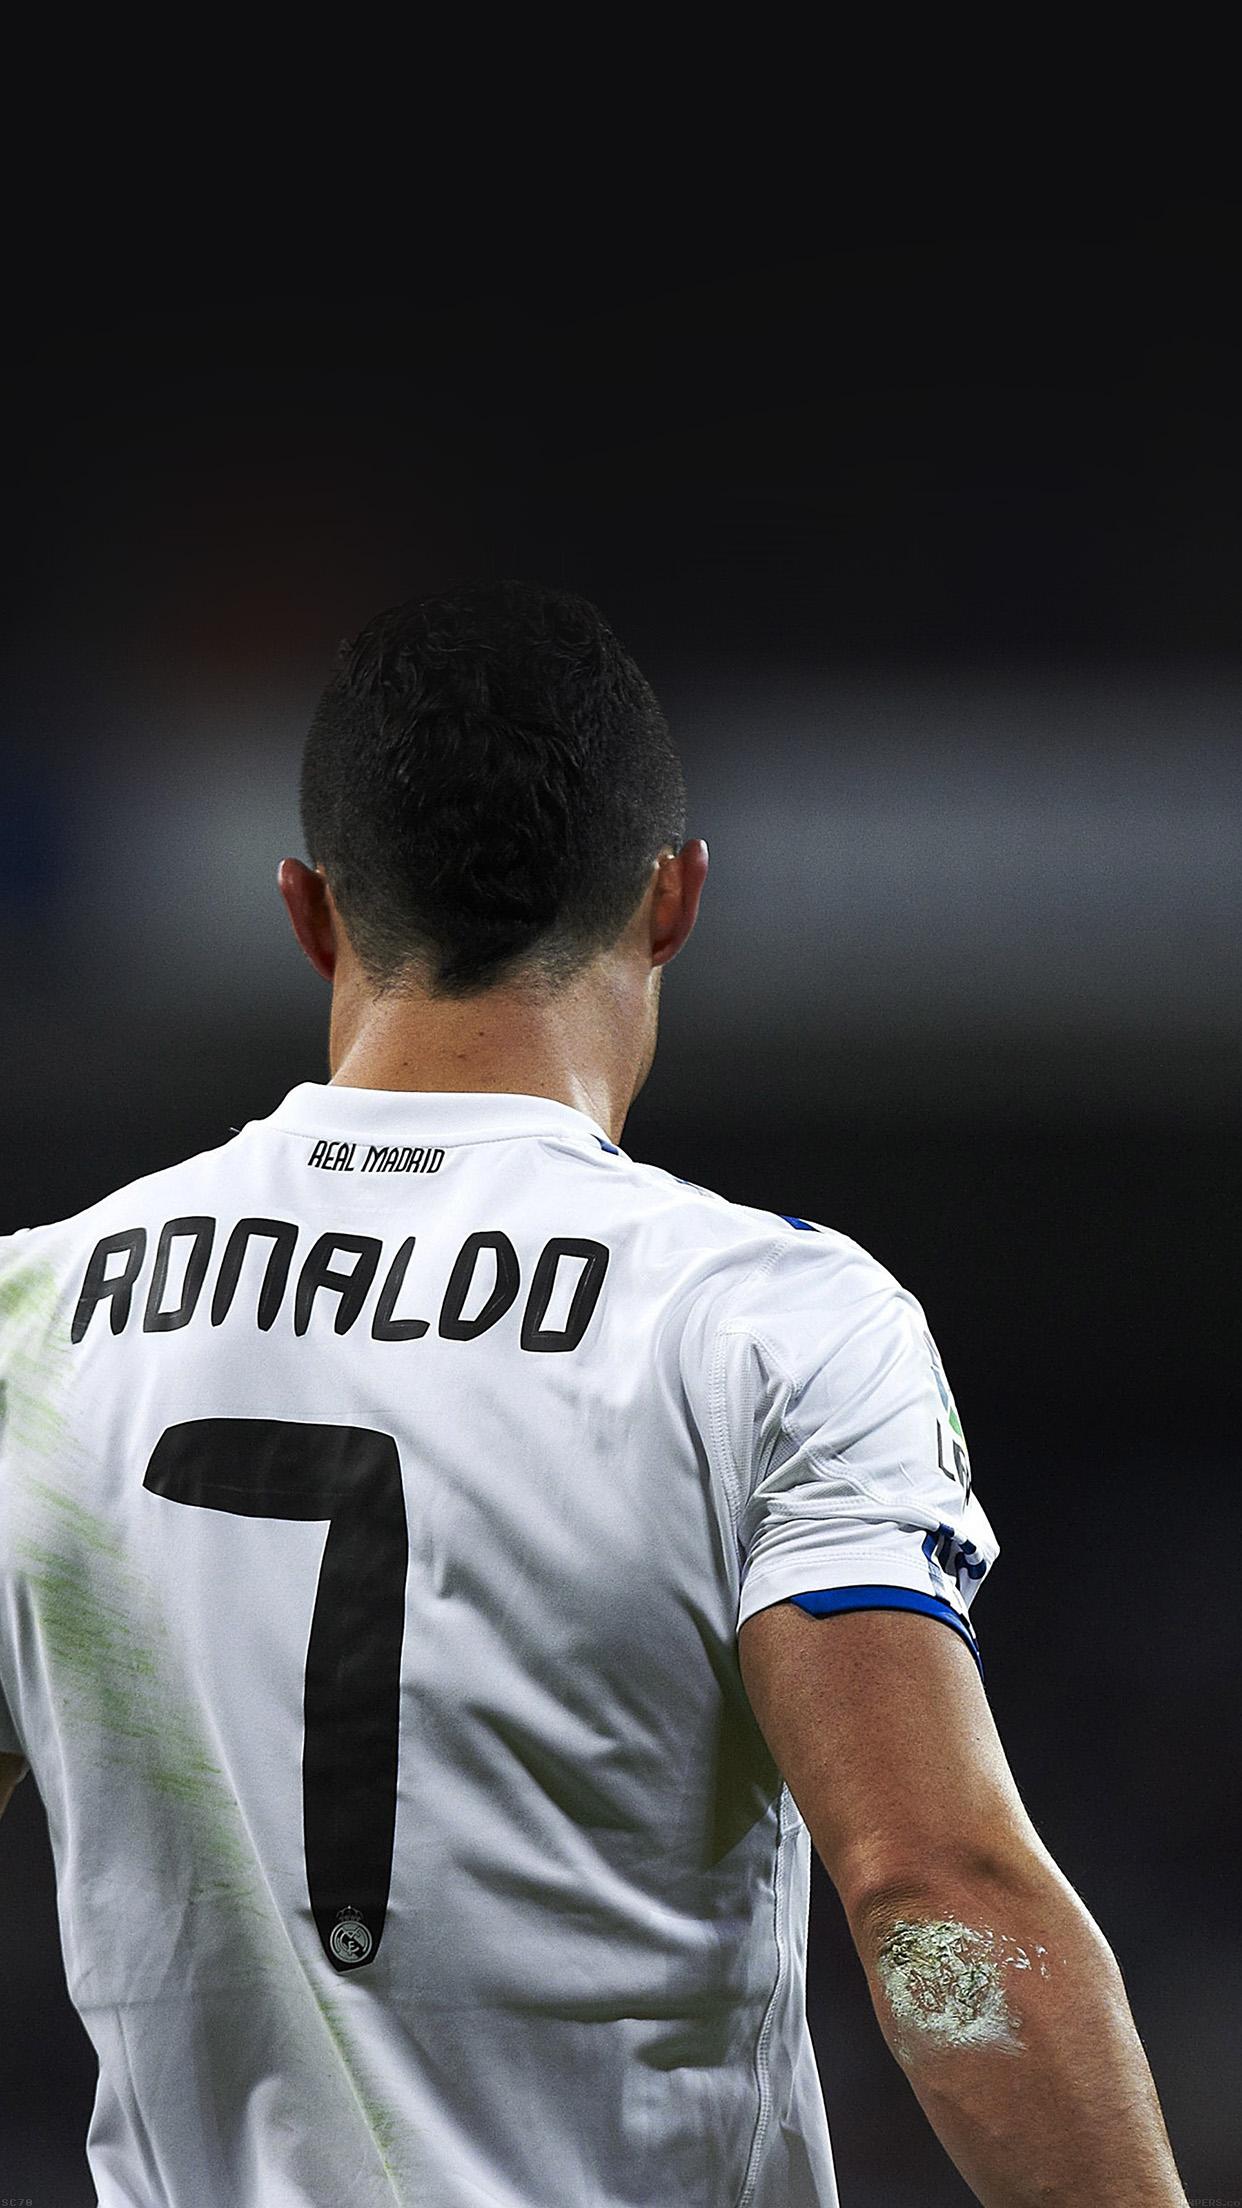 Cristiano Ronaldo 7 Real Madrid Soccer Android Wallpaper